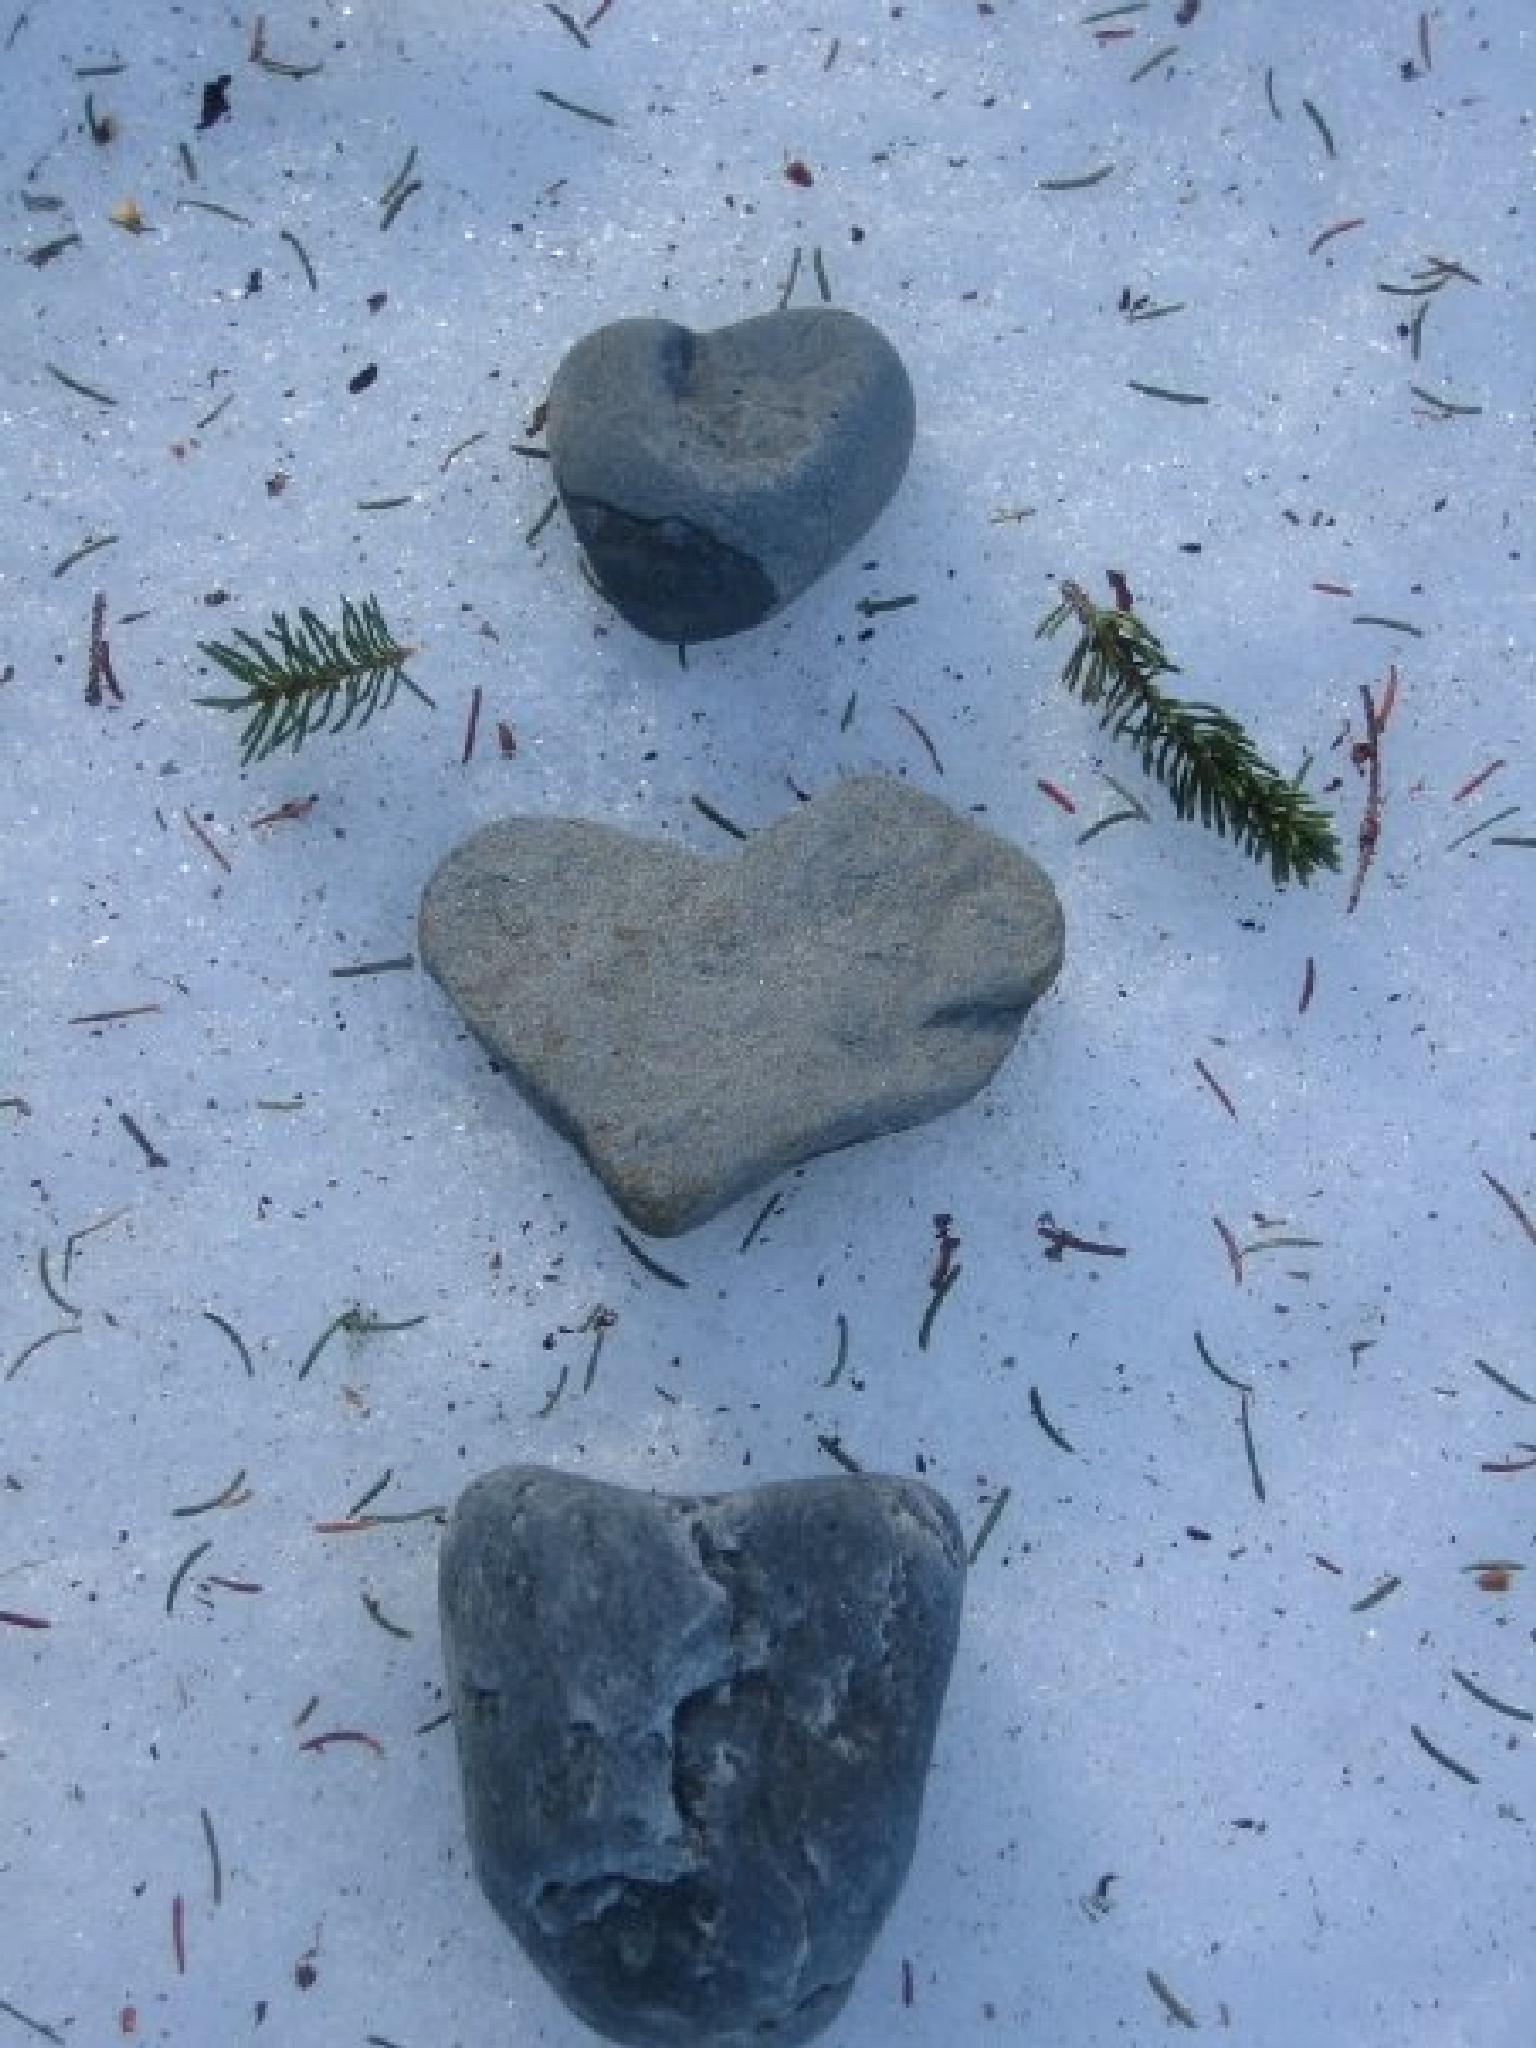 Rocks on Snow by Felicity Adams